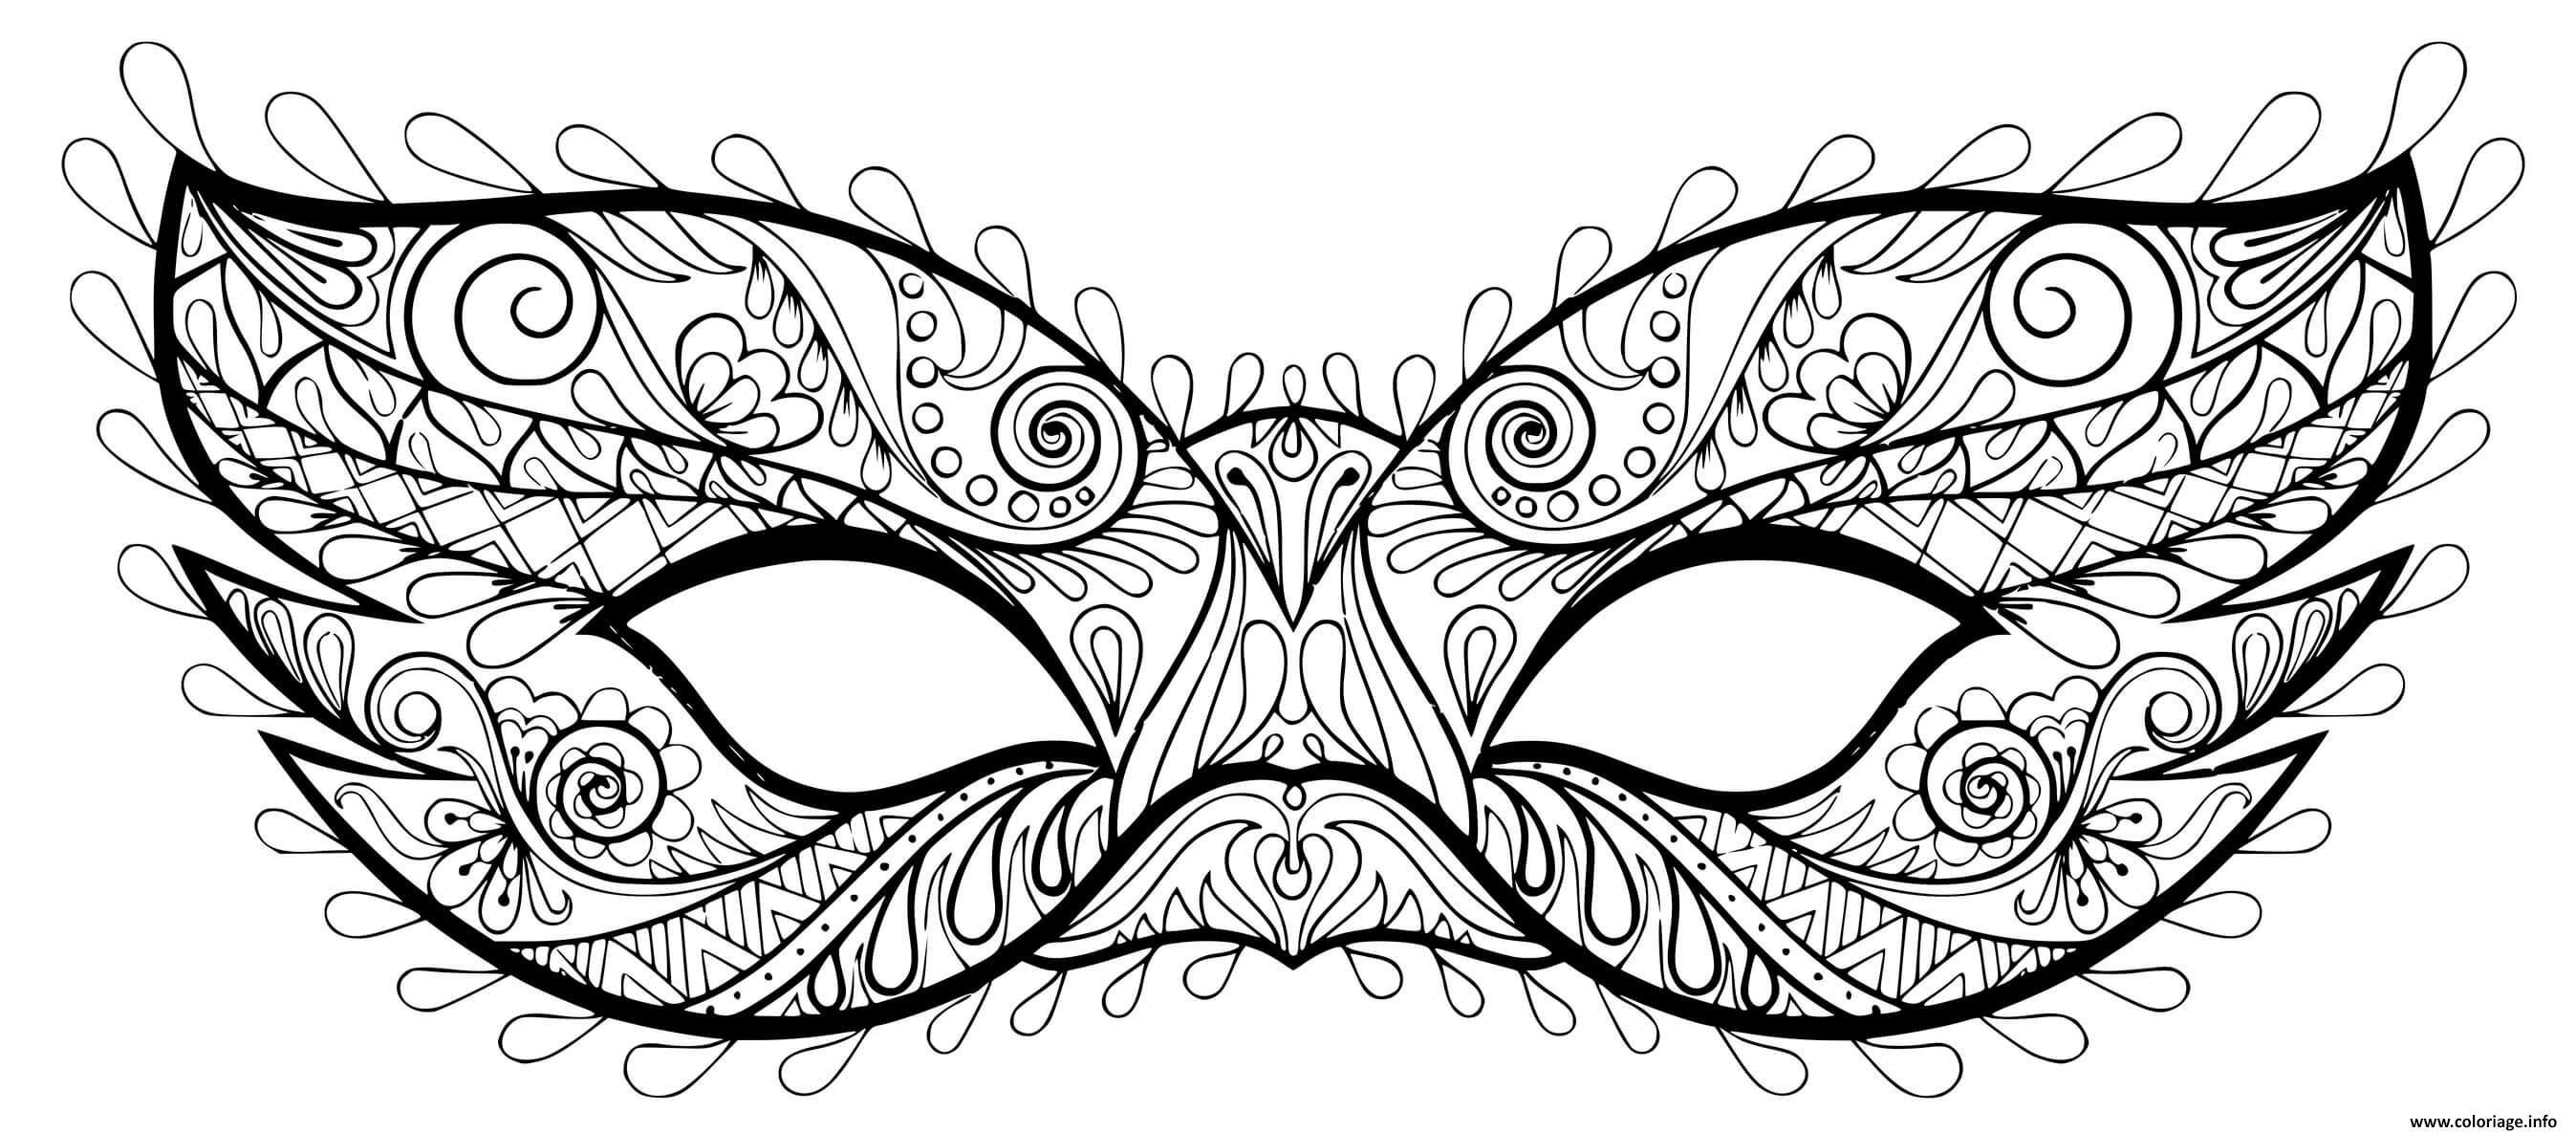 Coloriage masque carnaval mystere   JeColorie.com